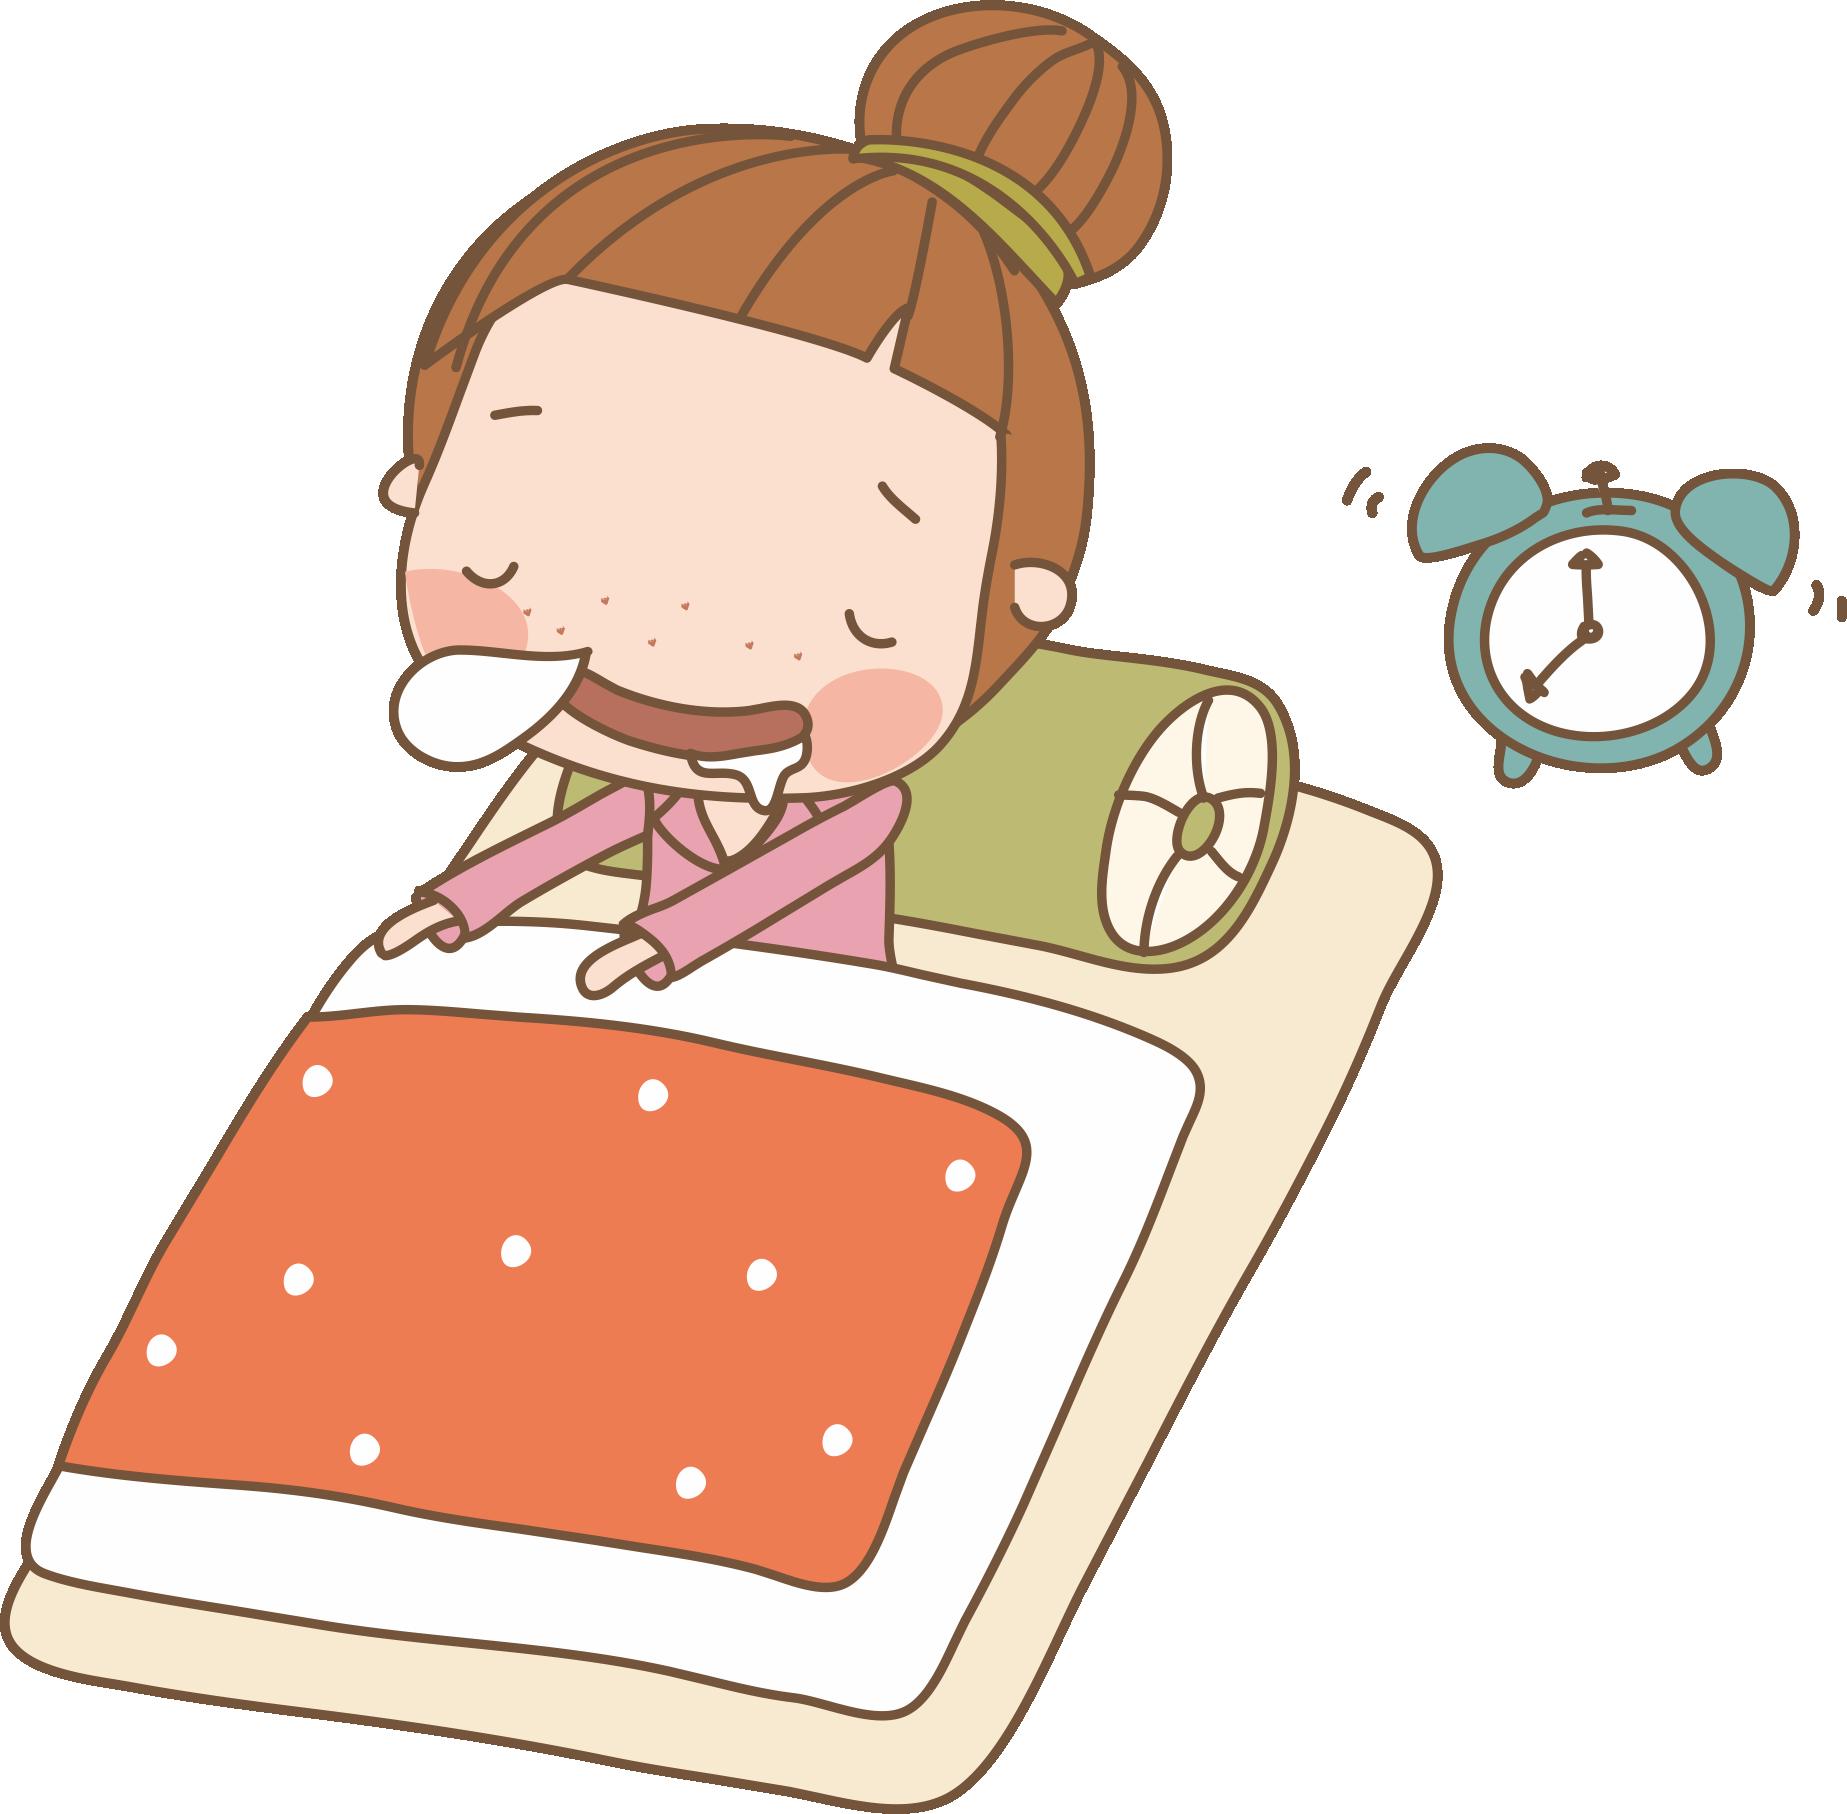 Sleep girl drawing sleeping. Dream clipart toddler bed